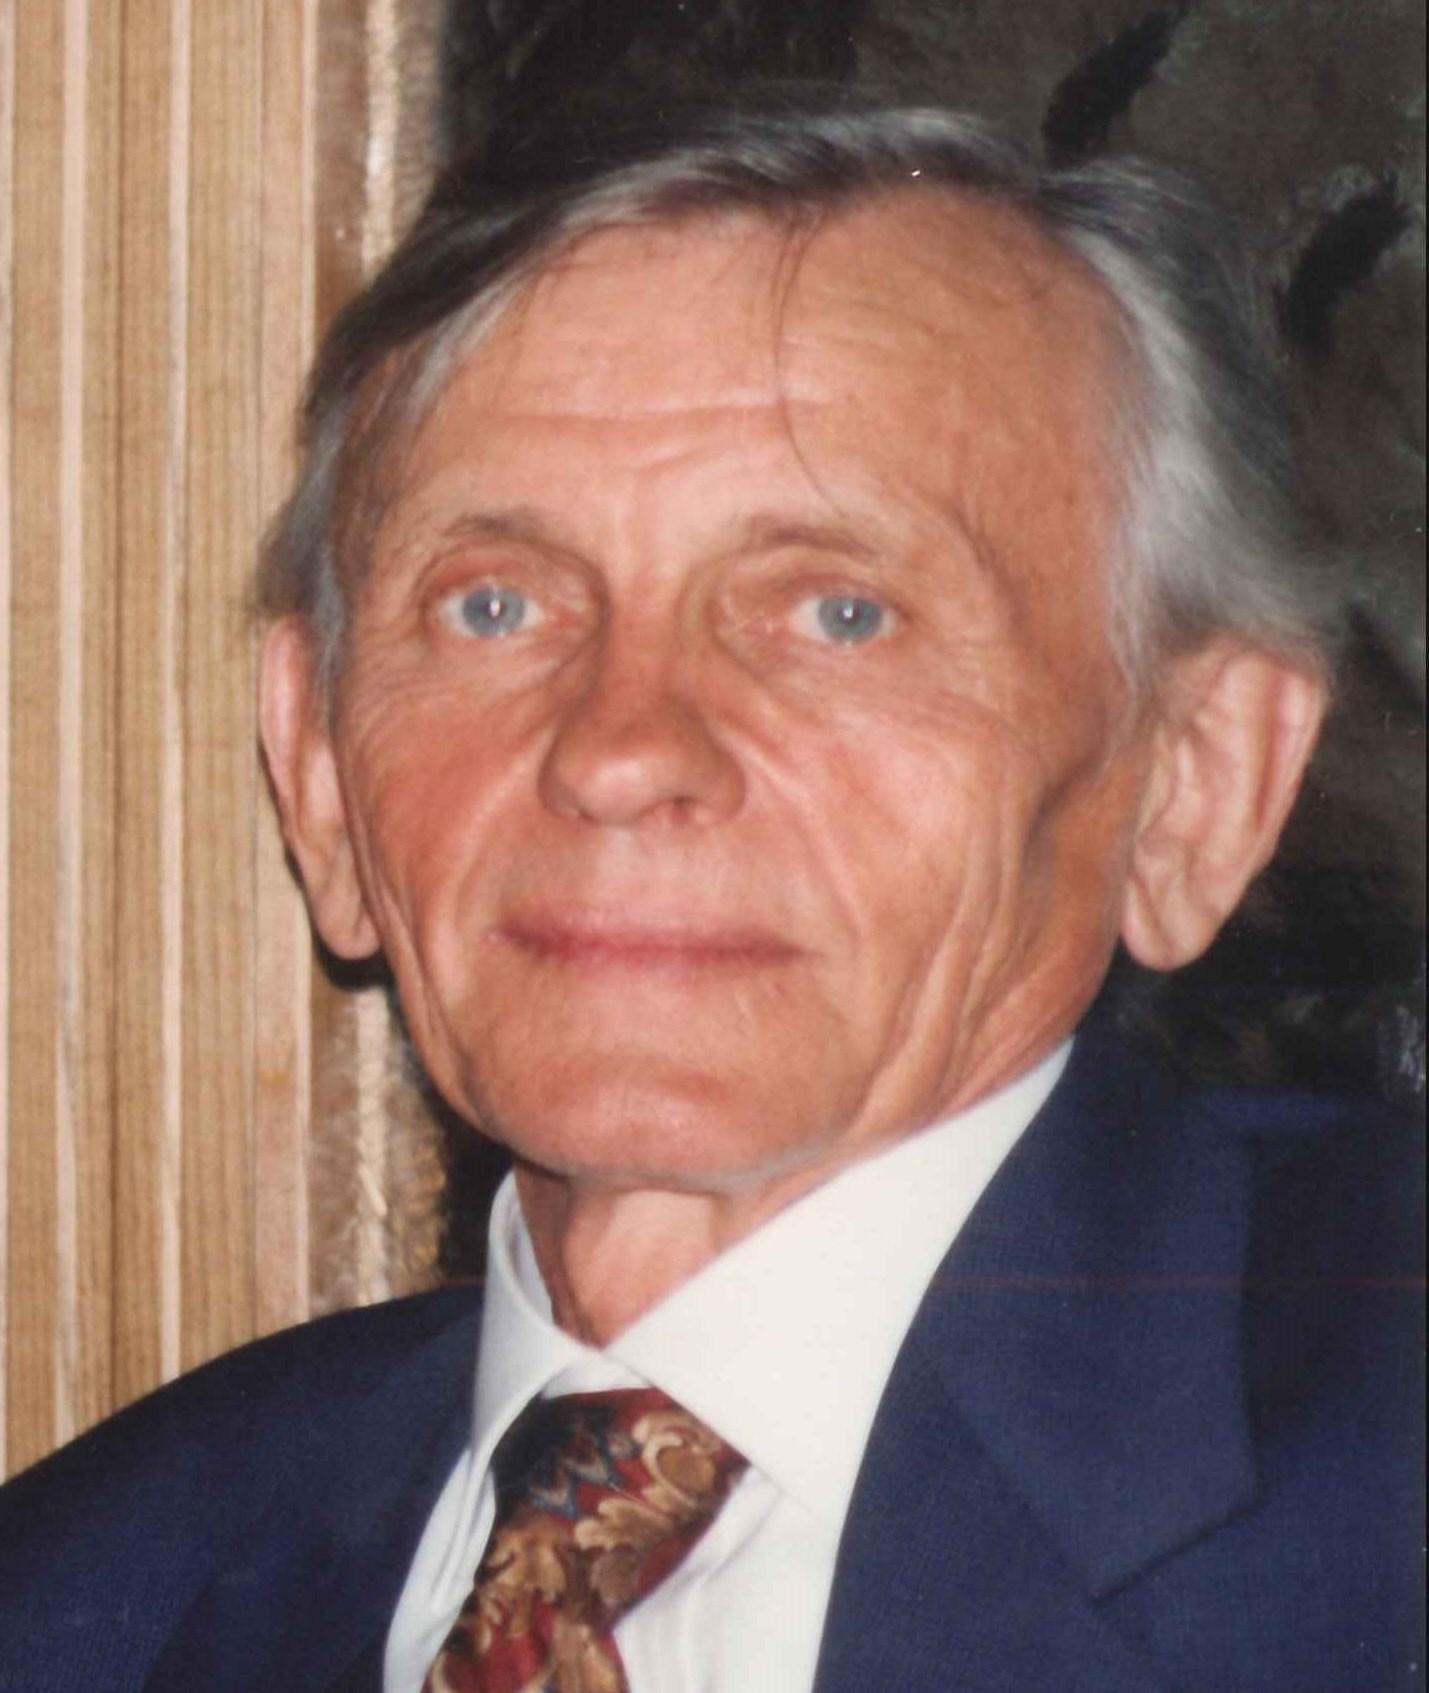 Antonio Colle